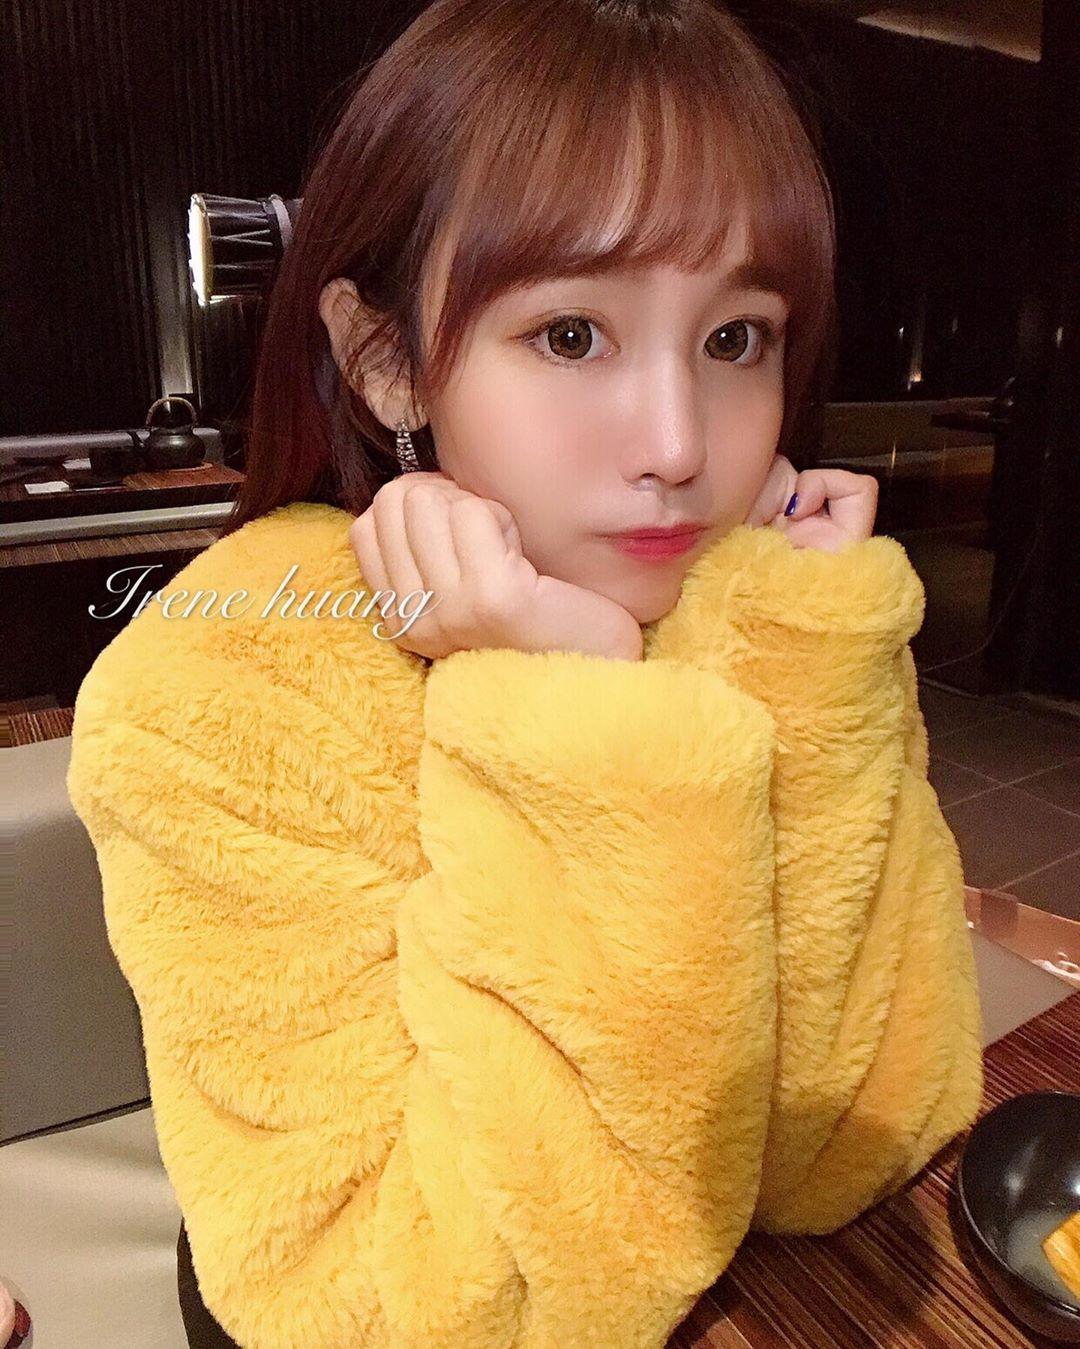 IreneHuang  甜美女孩氣質出眾讓人戀愛  有初戀ㄉ感覺 - 素人正妹 -